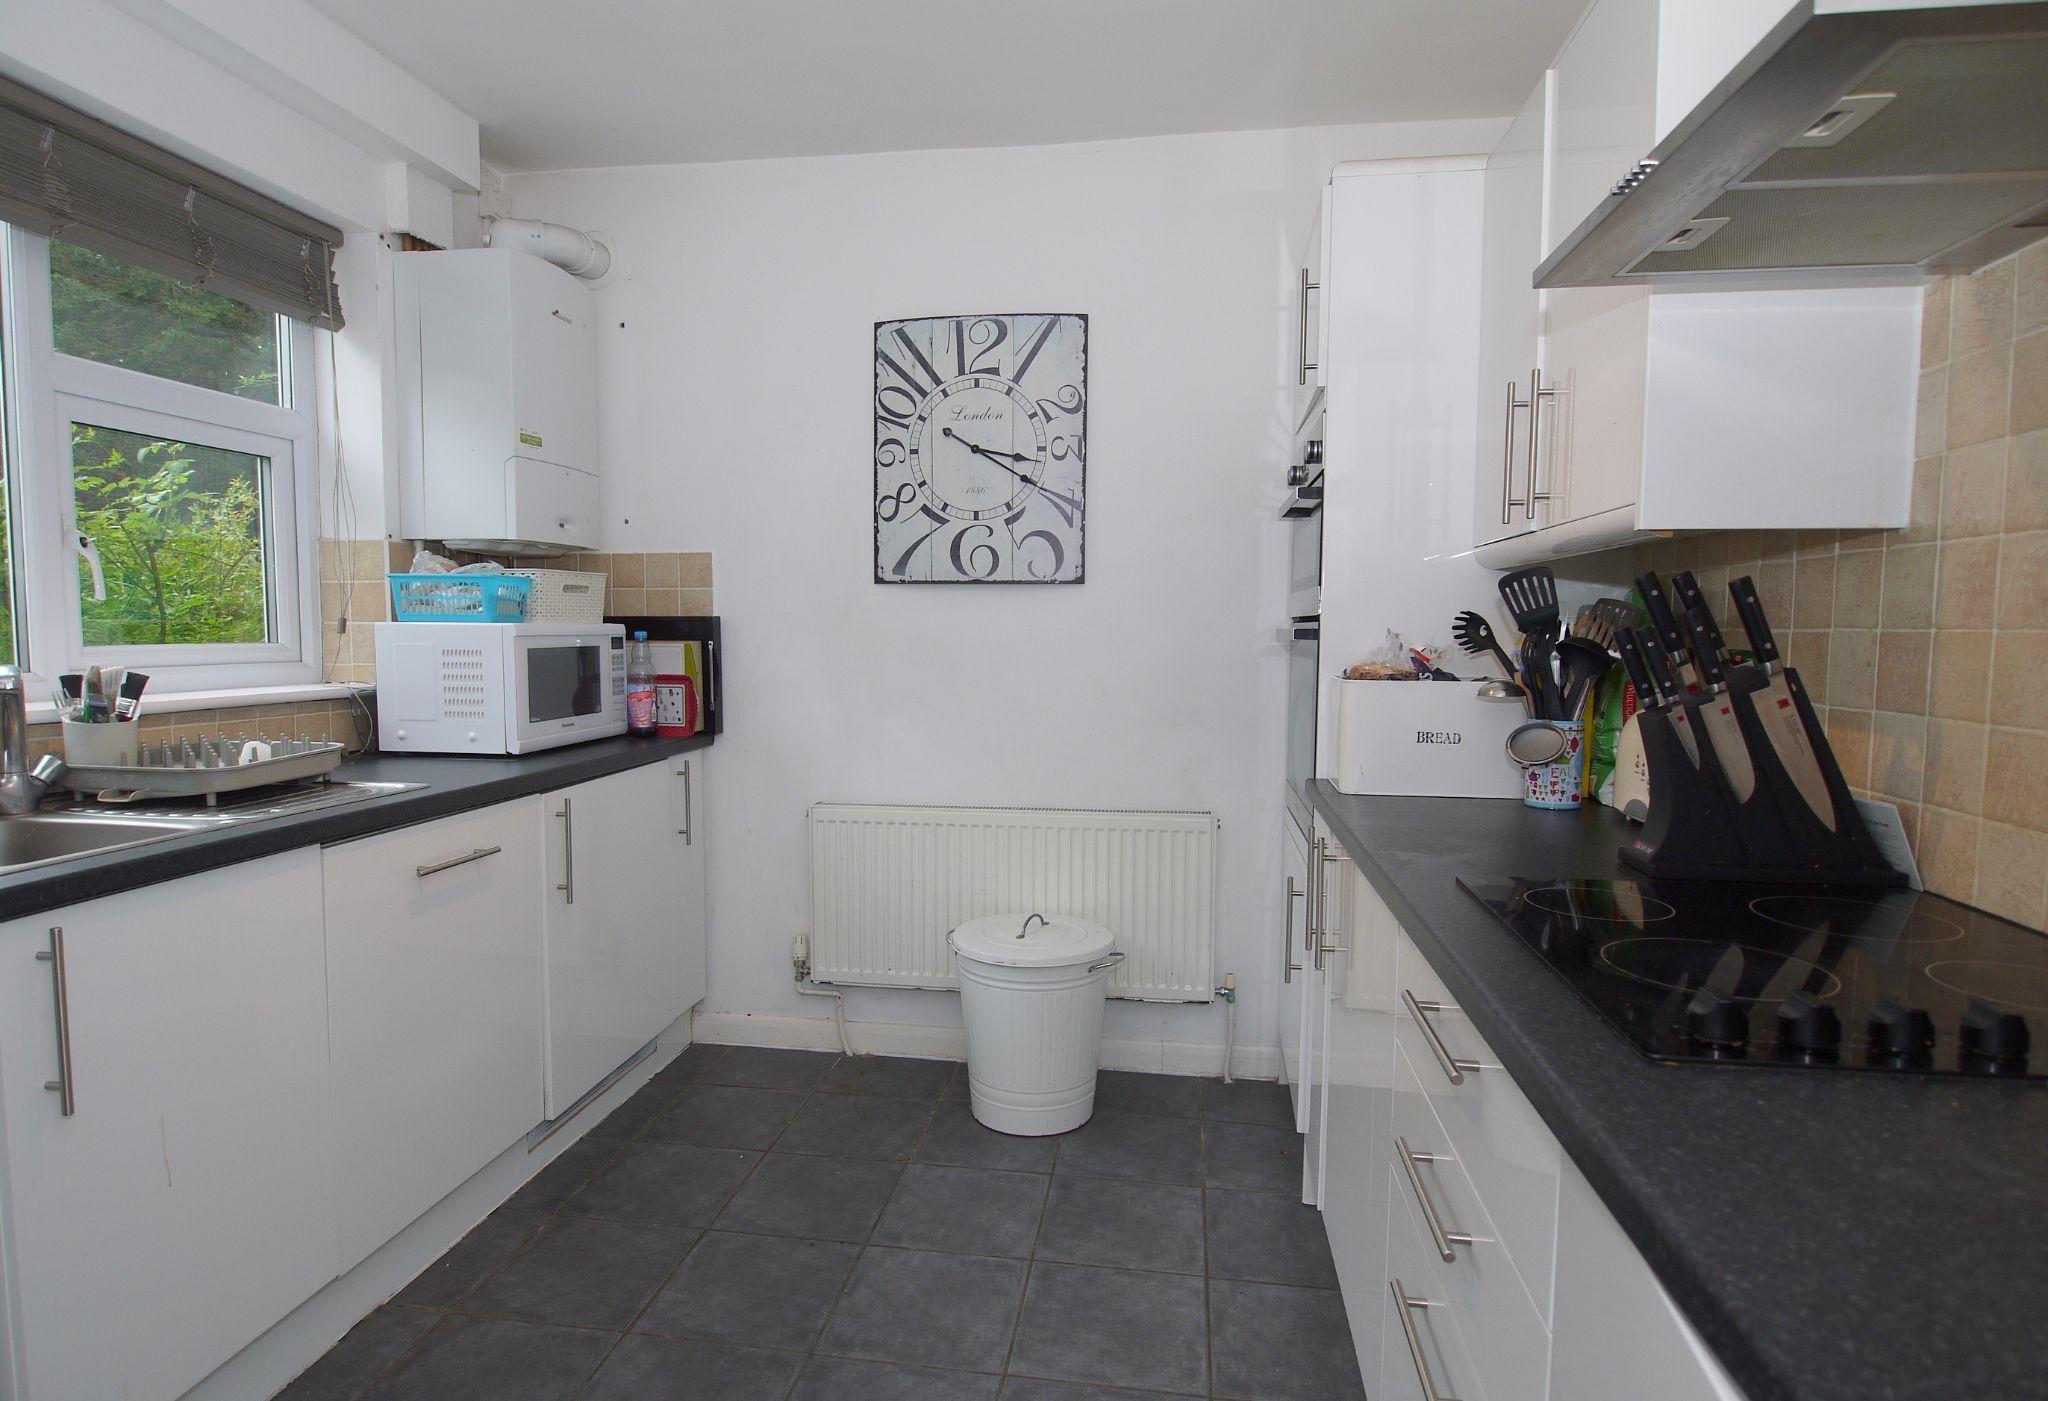 3 bedroom apartment Sold in Sevenoaks - Photograph 4